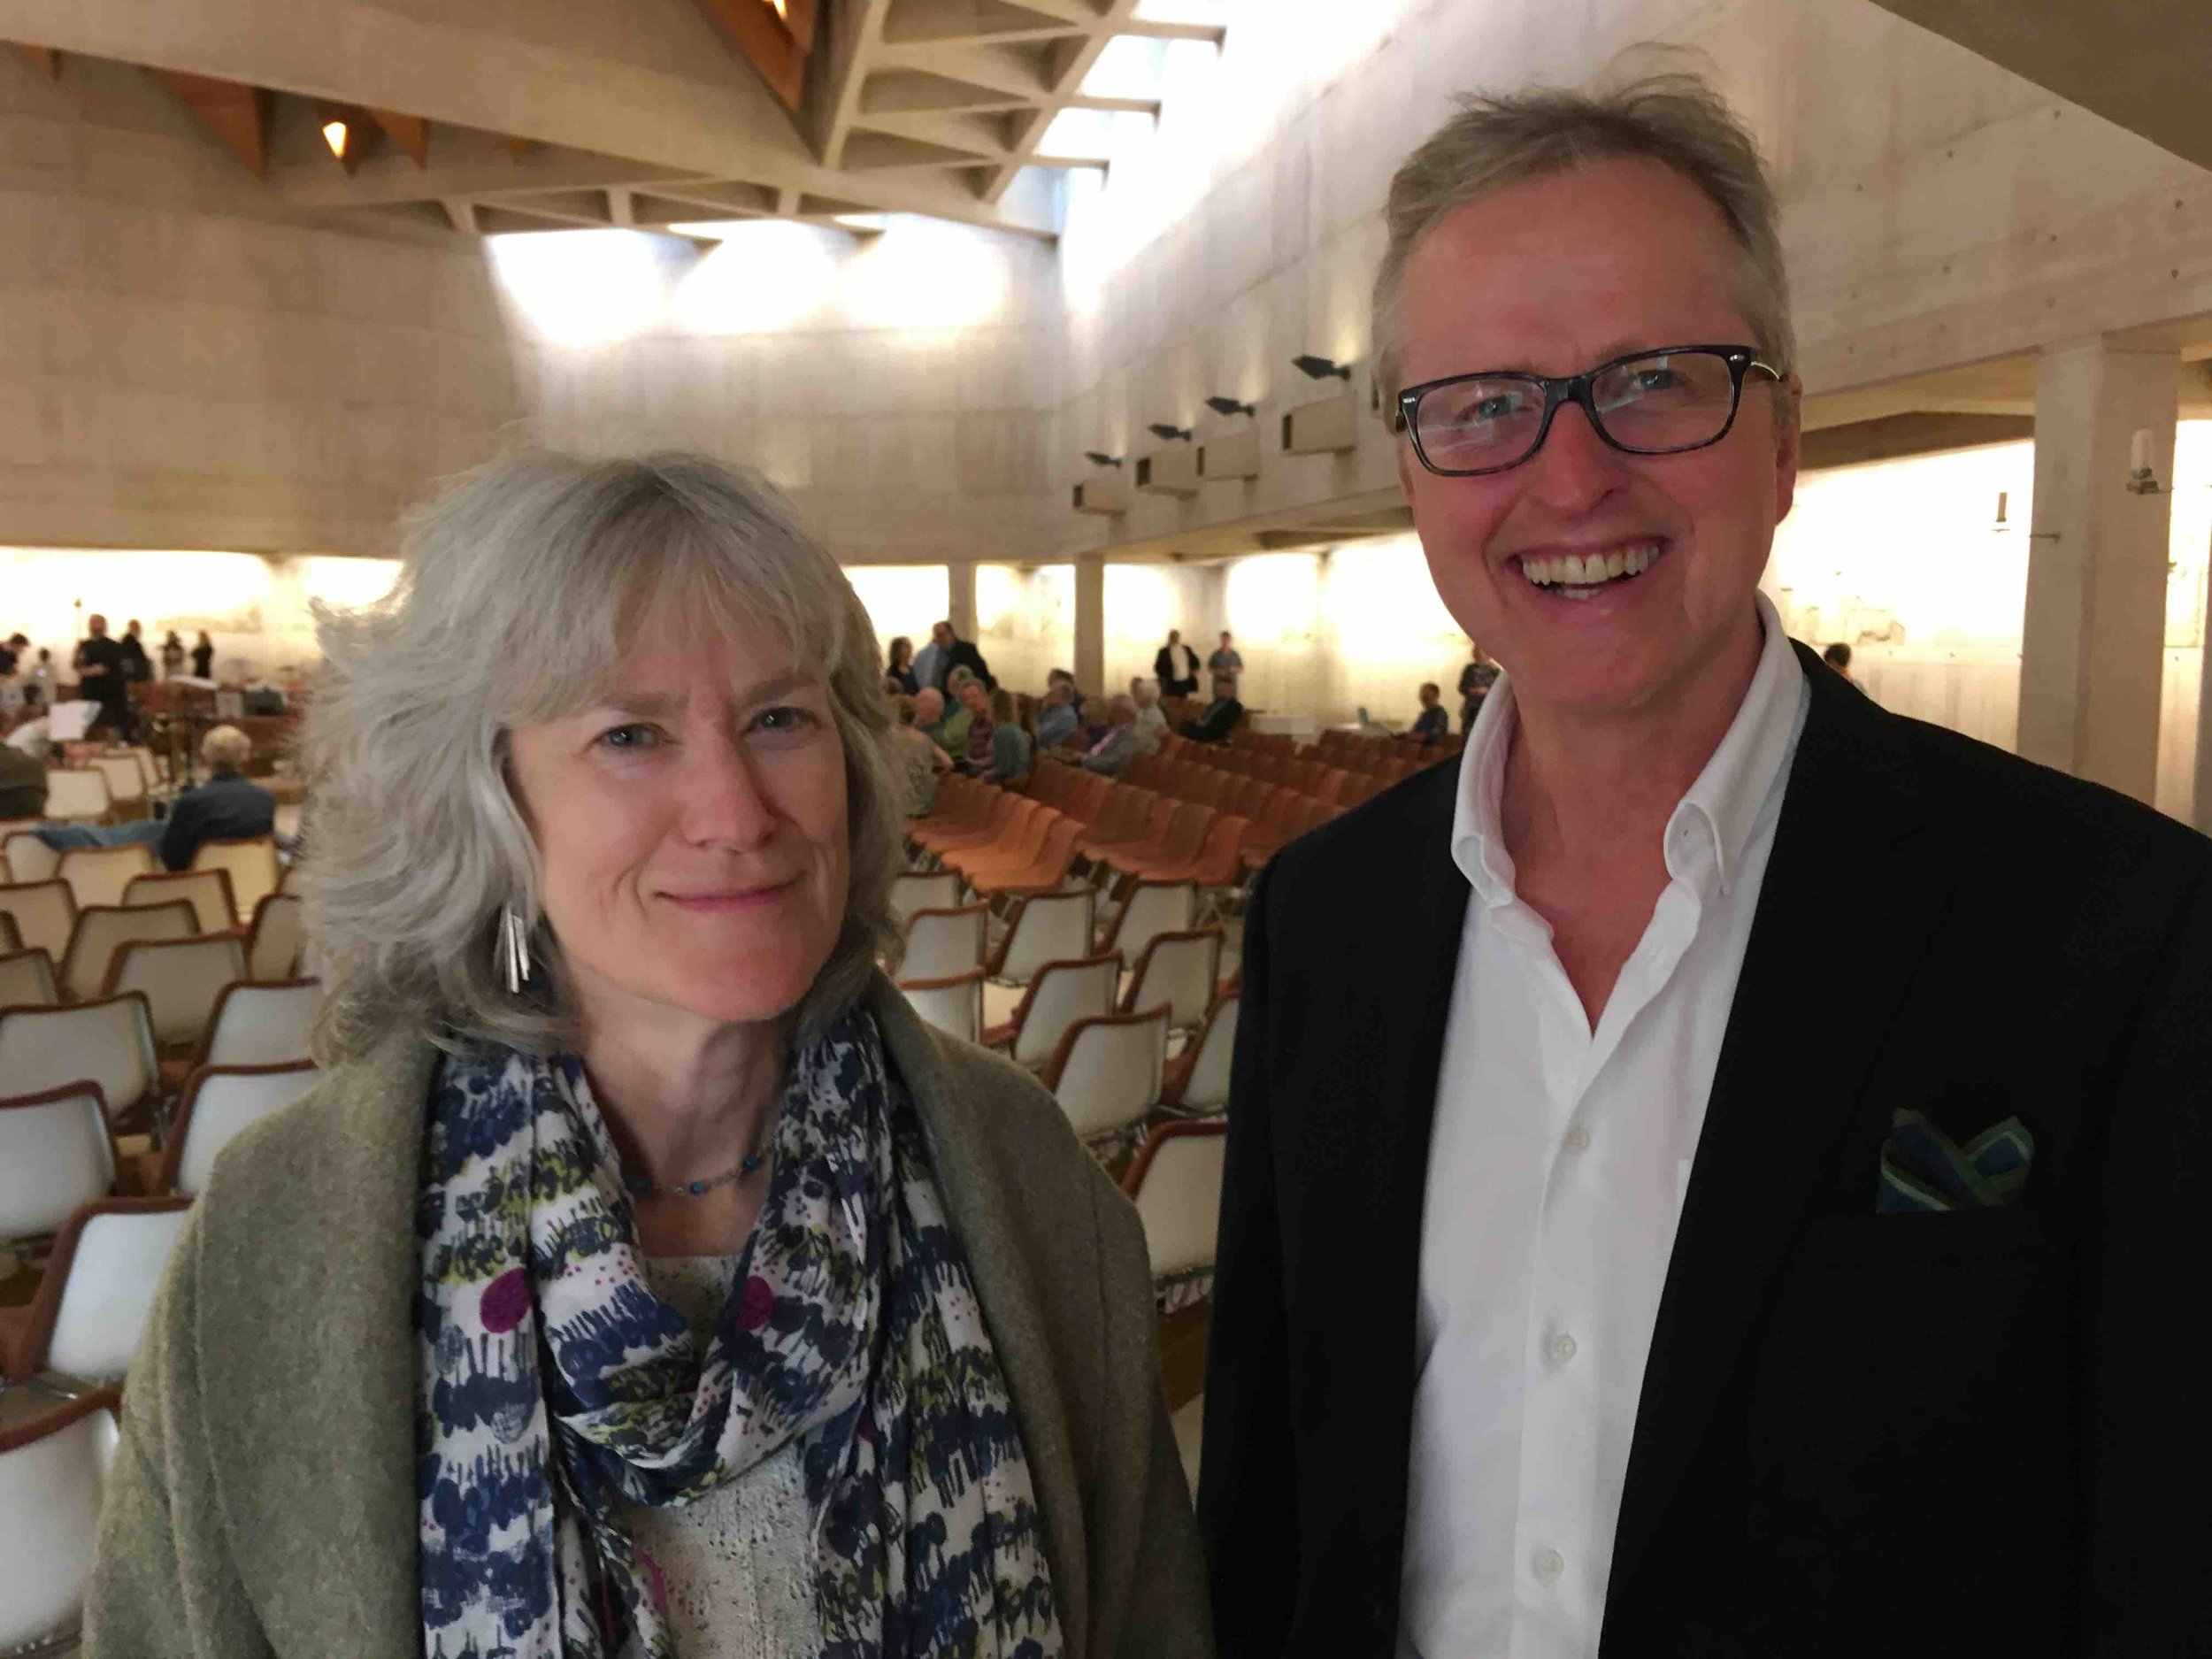 Jean and composer/conductor William Goodchild, June 2019